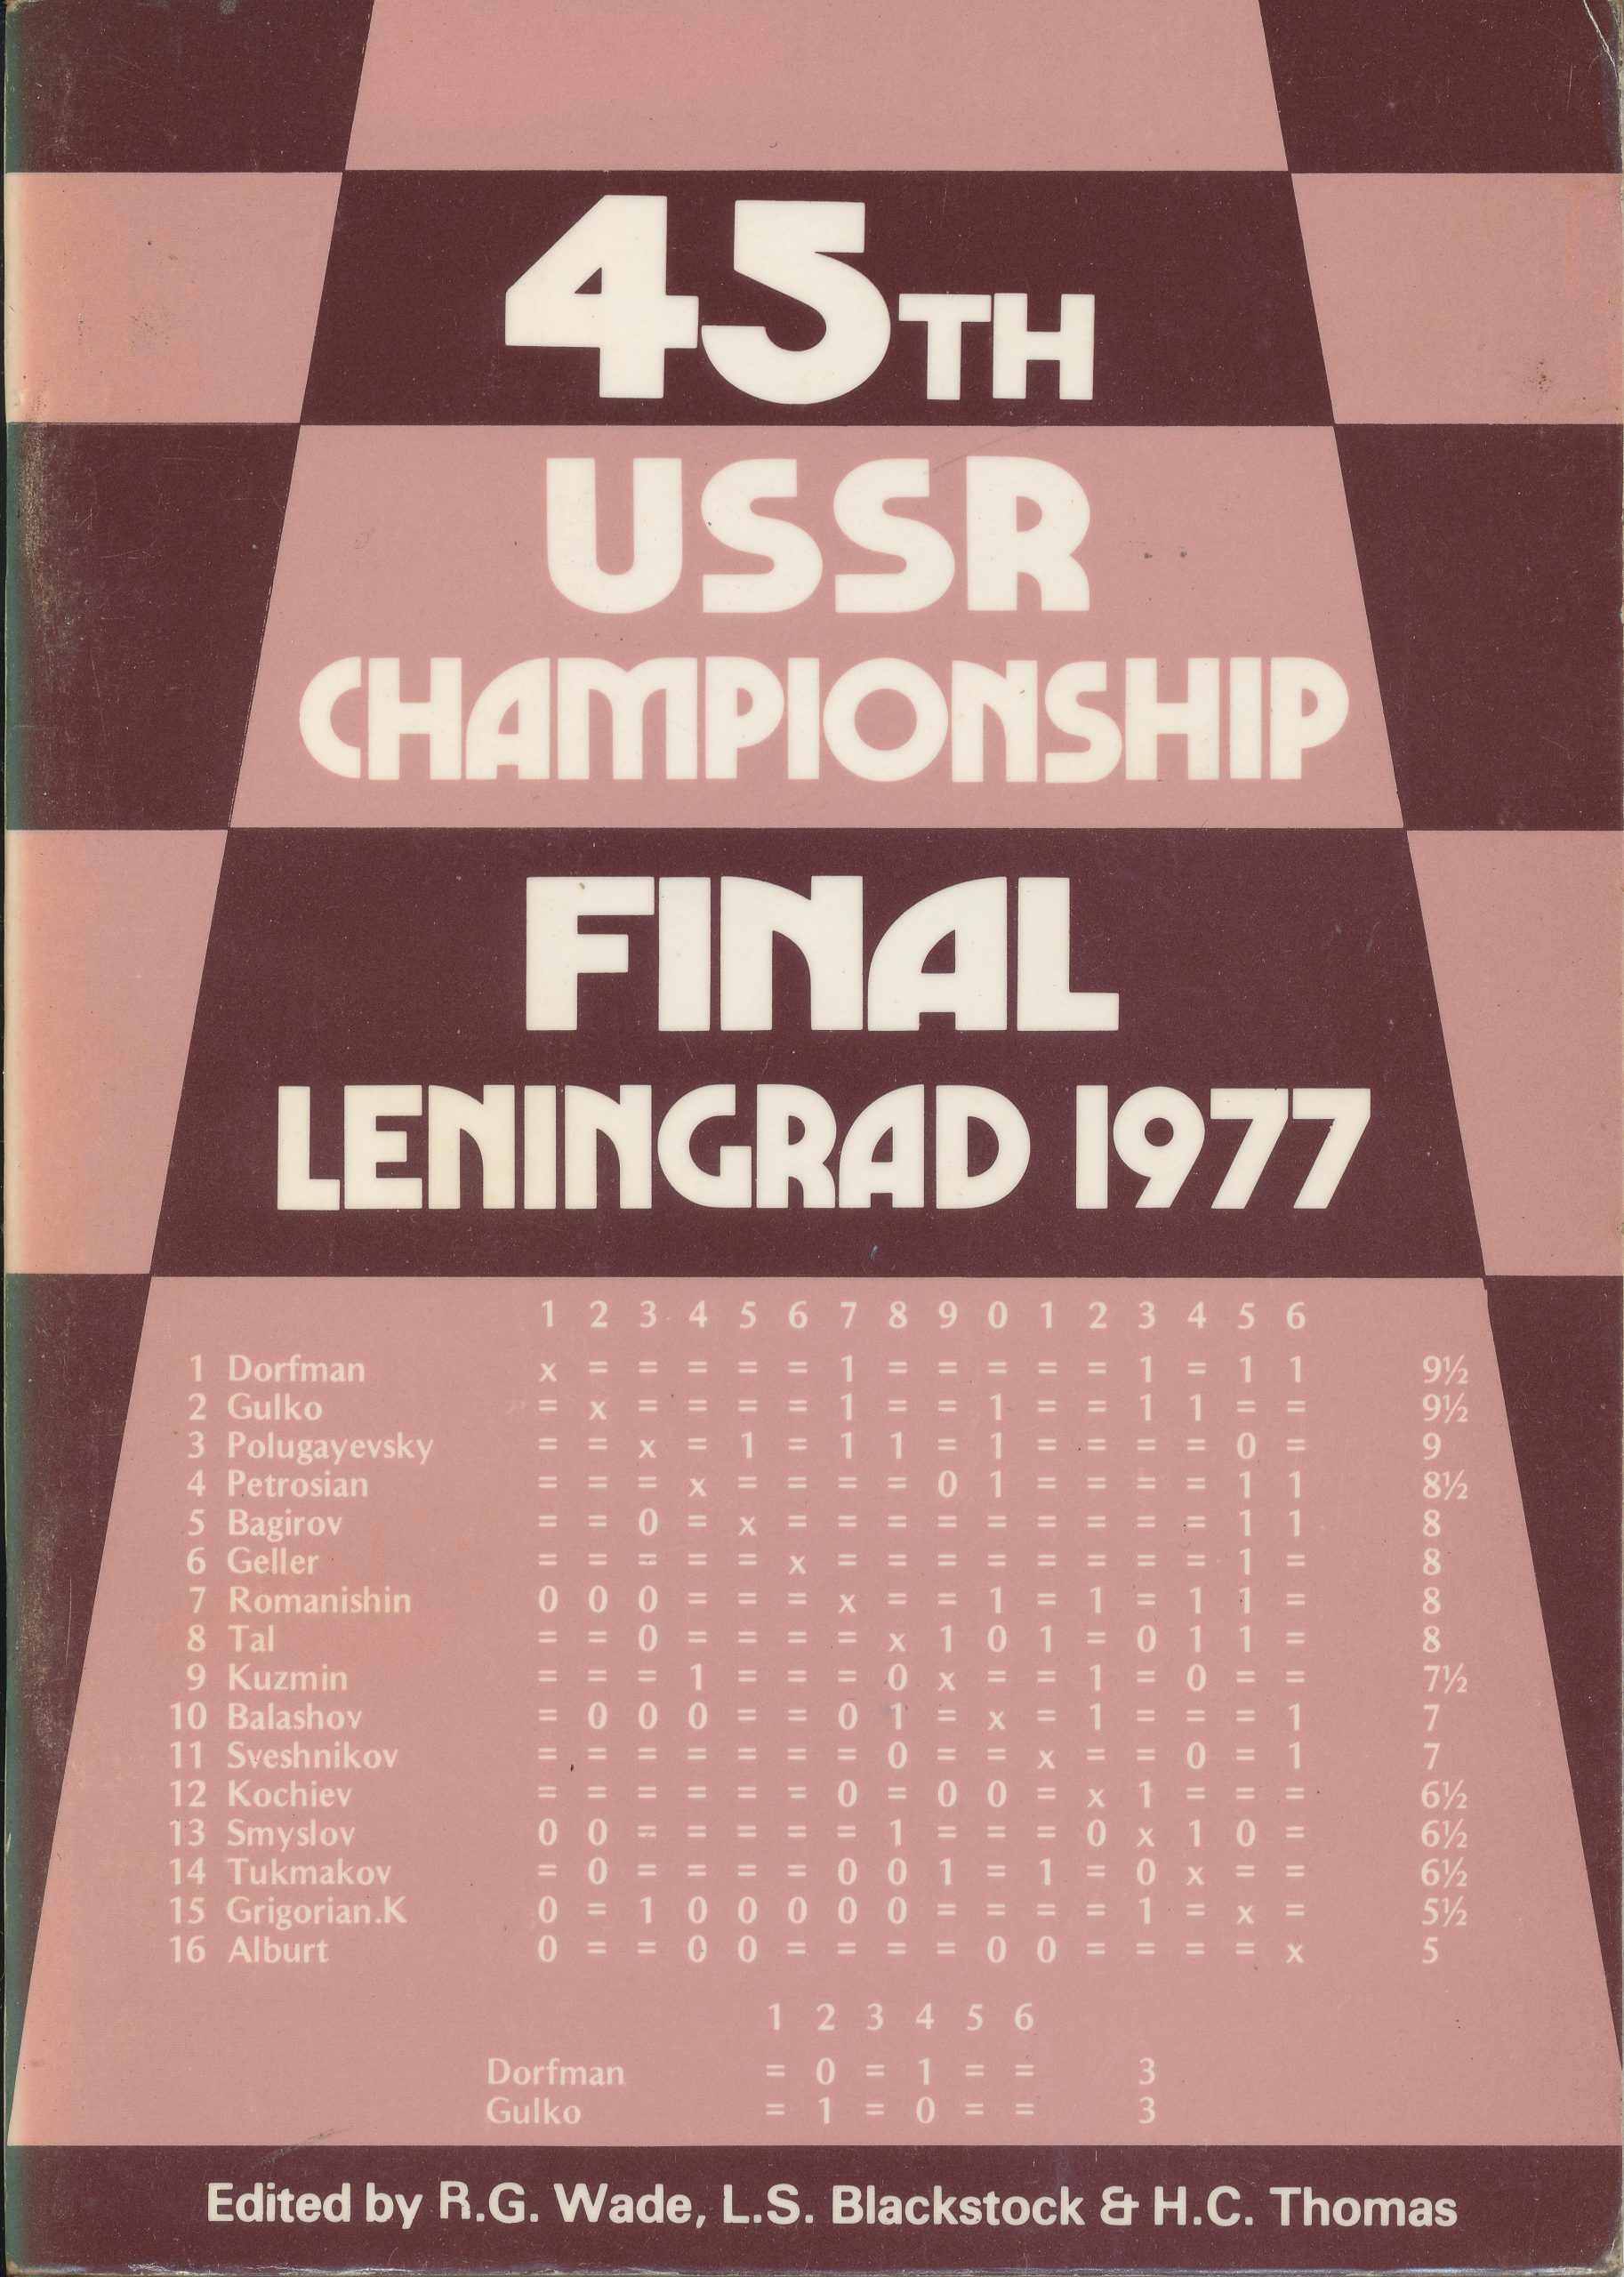 45th USSR Championship Final Leningrad 1977, RG Wade, LS Blackstock and HC Thomas, Master Chess Publications, 1977